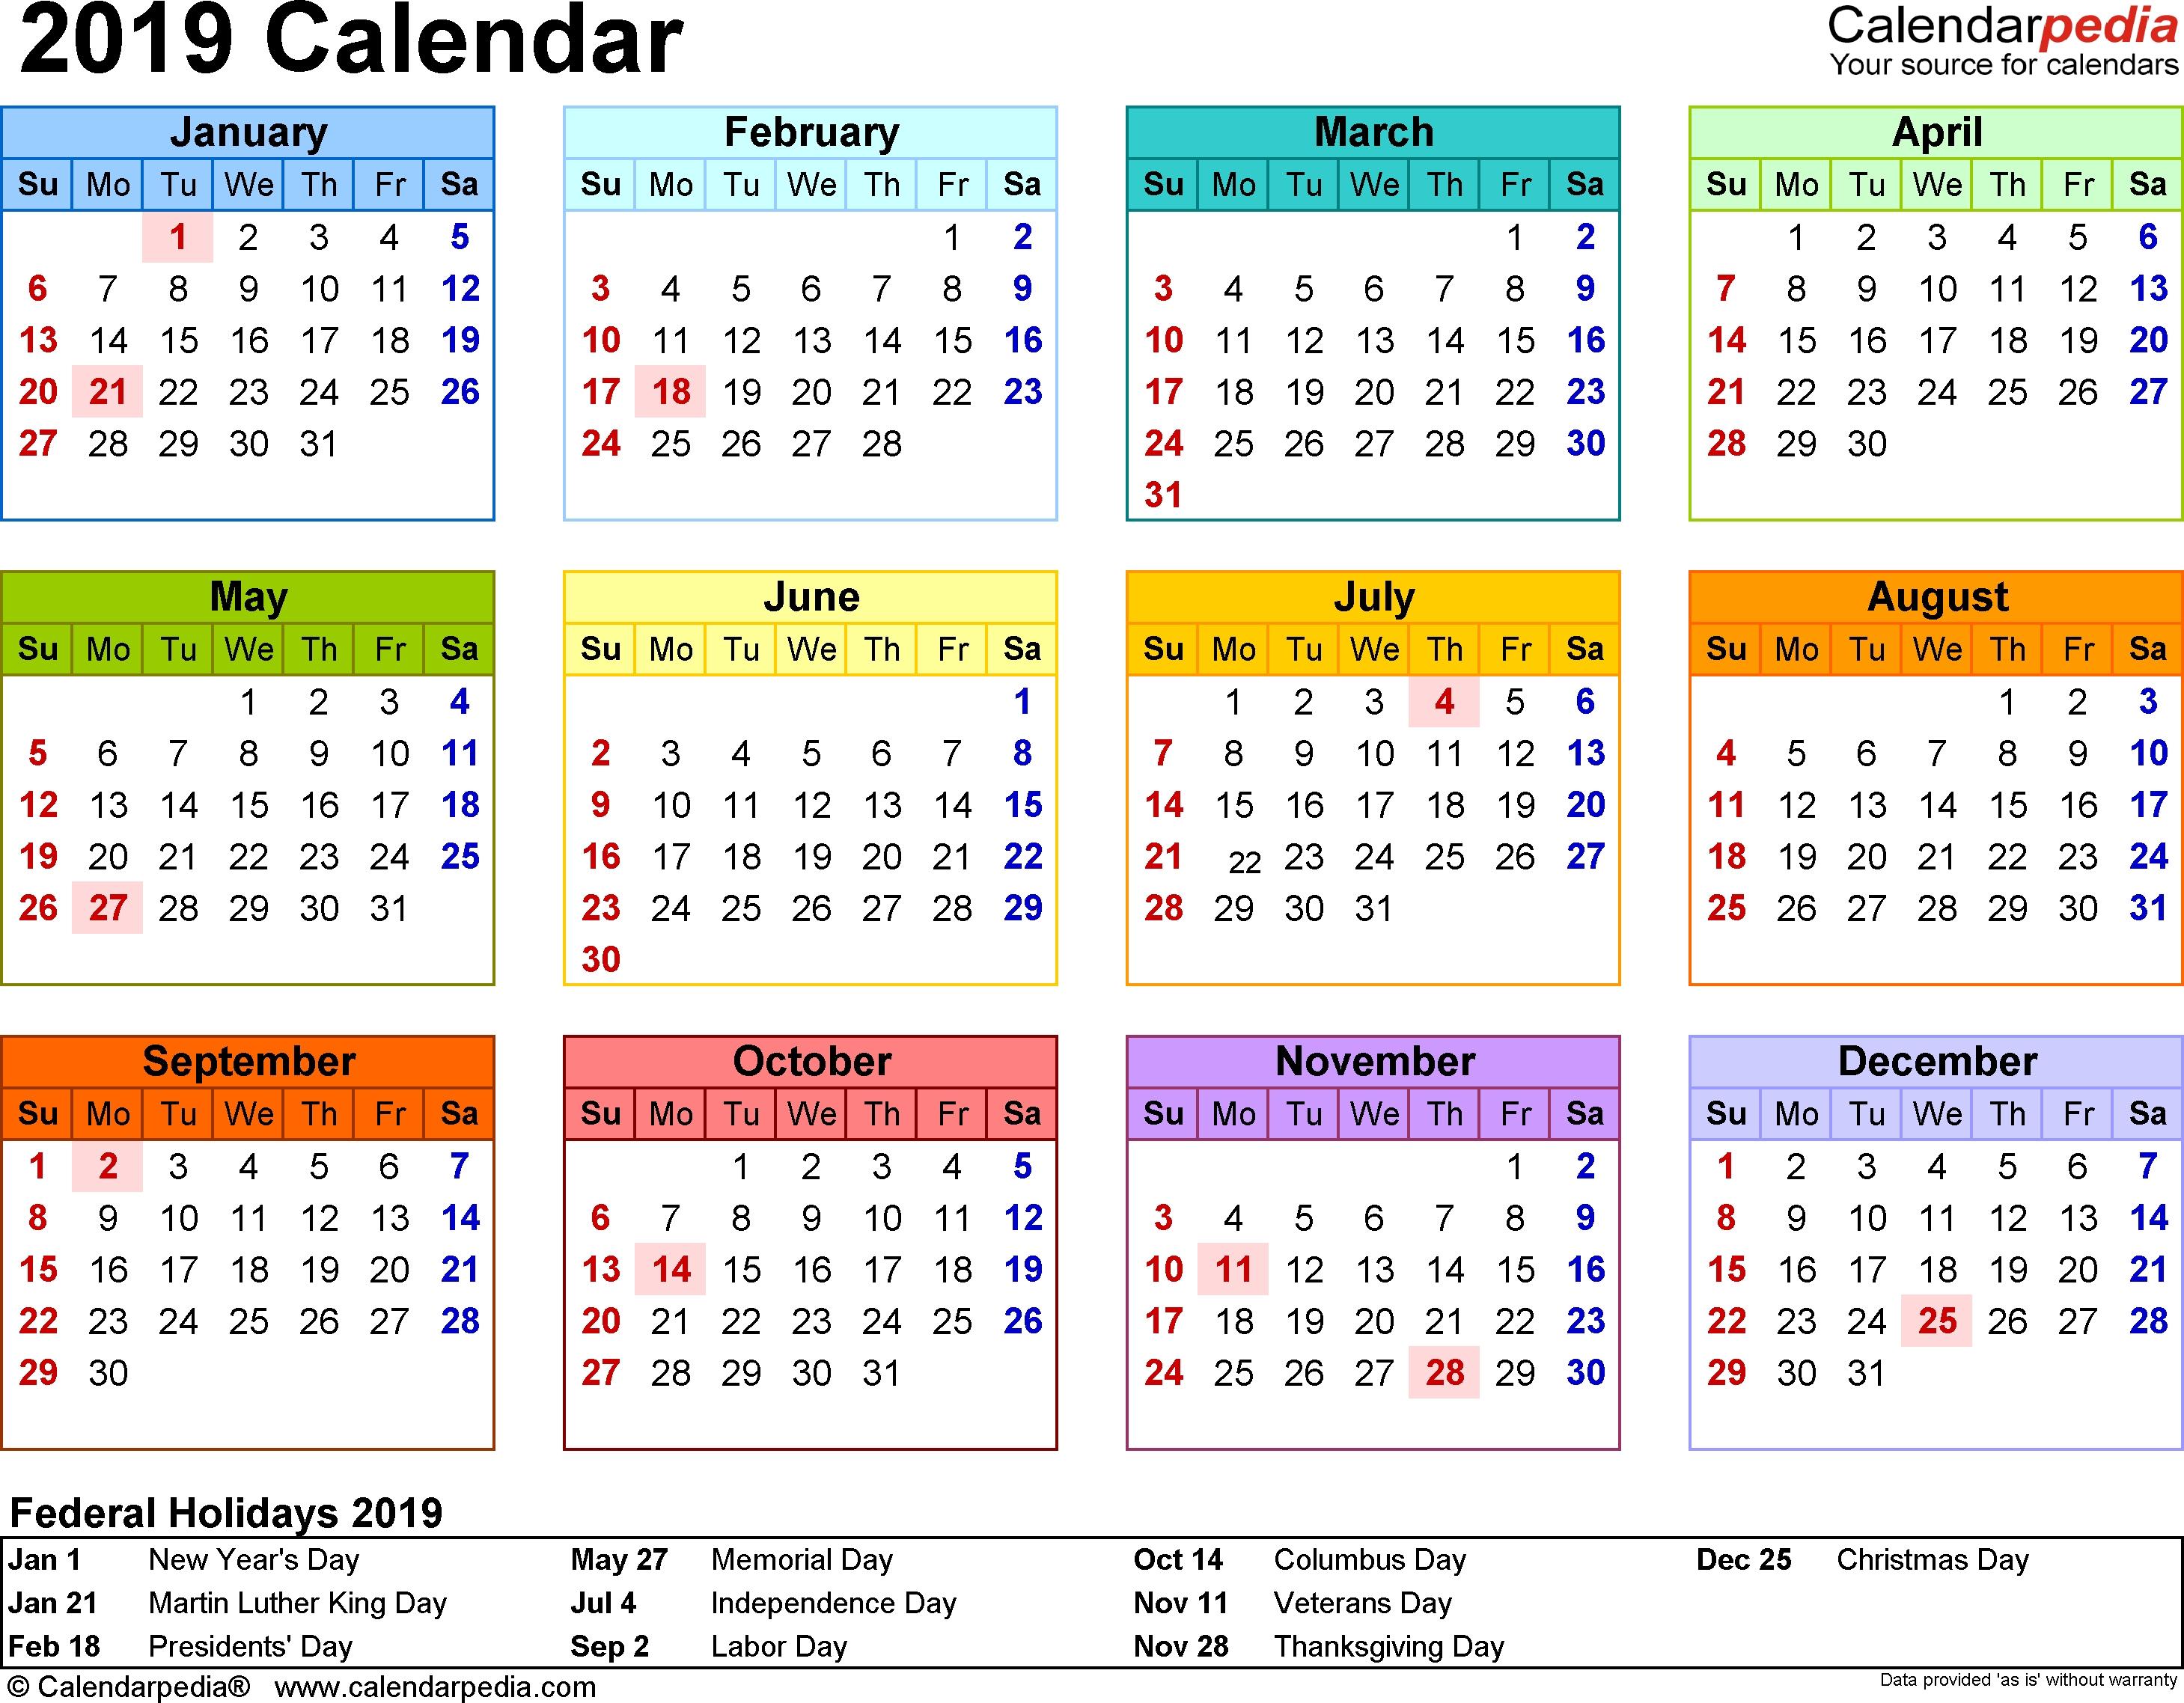 2019 Calendar - Download 17 Free Printable Excel Templates (.xlsx) pertaining to Calendar 2020 Excell Romania